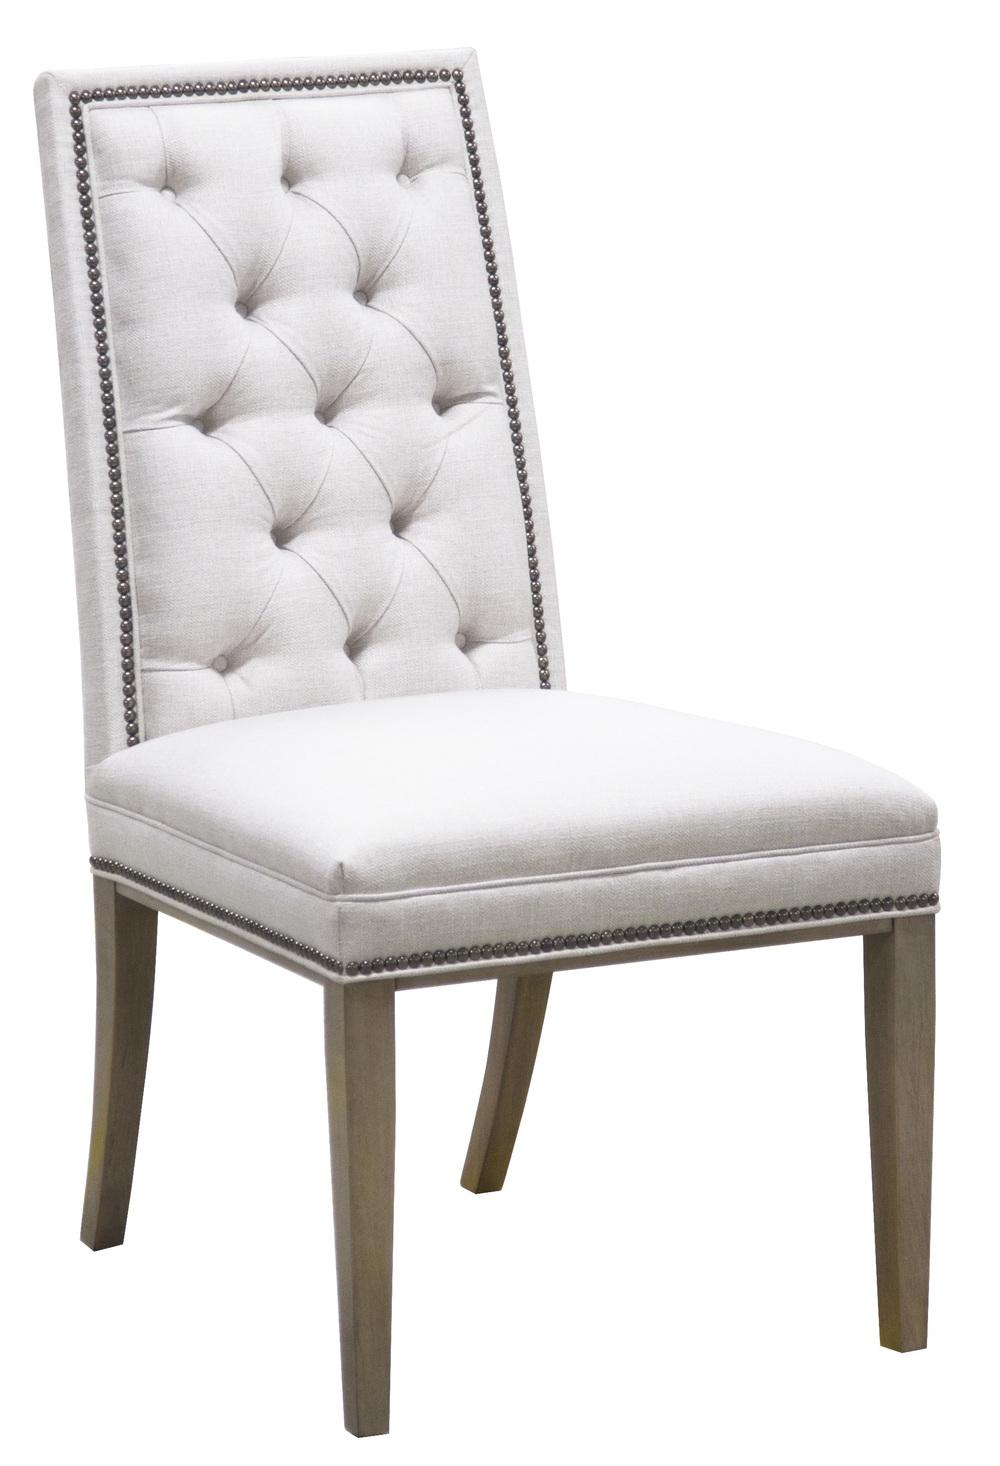 Vanguard Furniture - Hanover Side Chair